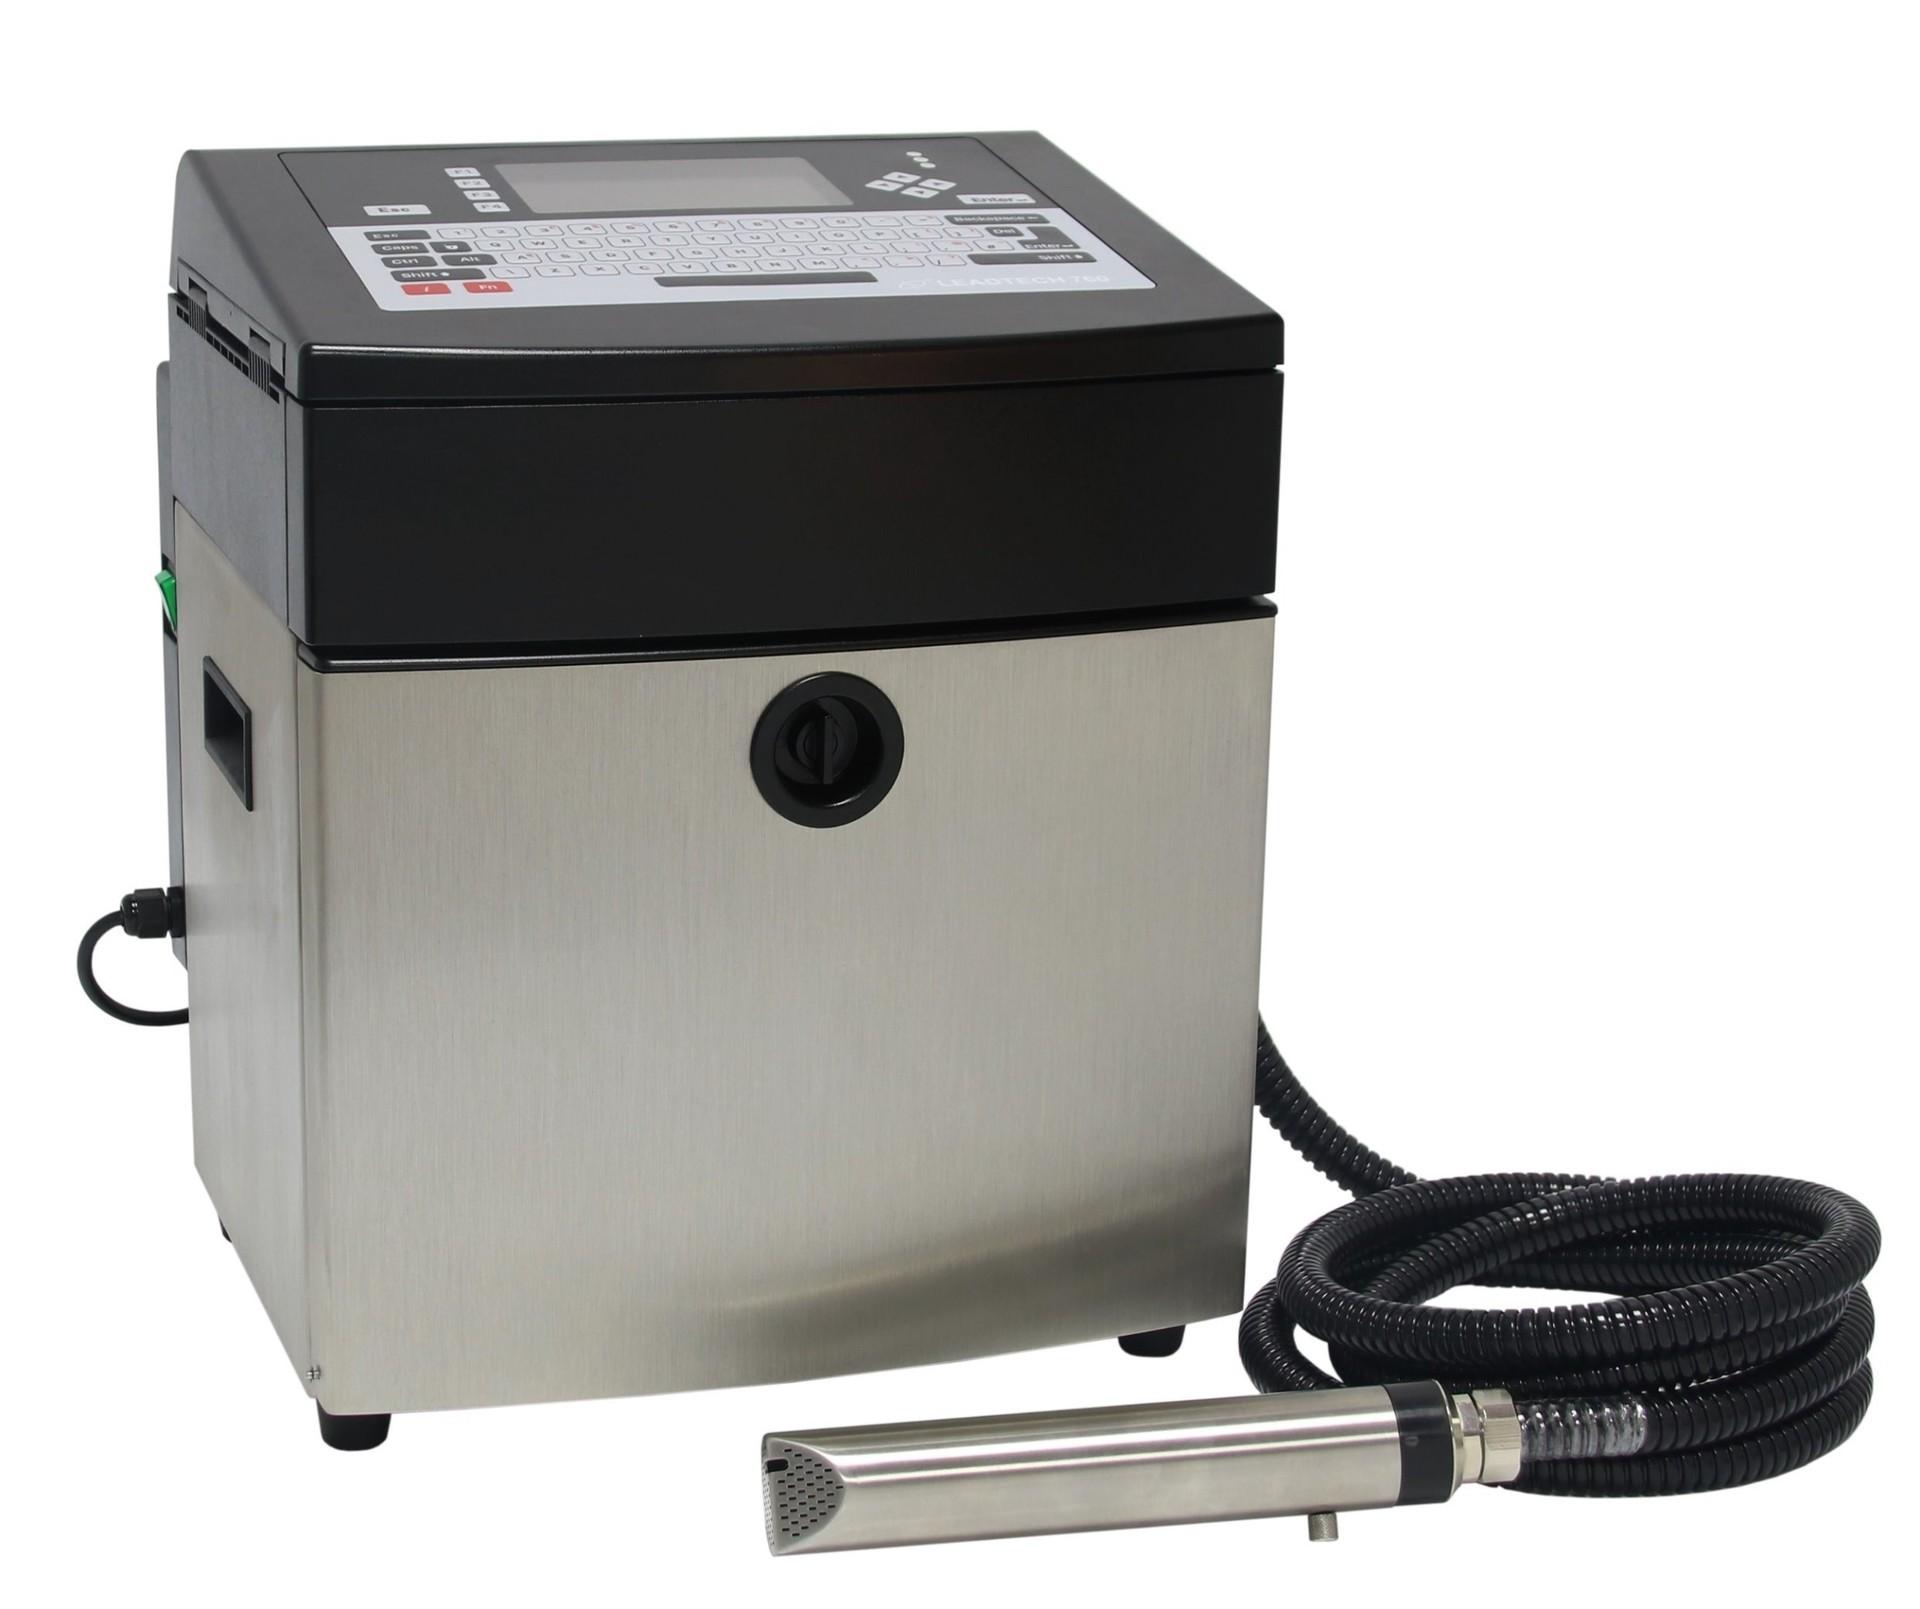 Lead Tech Lt760 HDPE Coding Inkjet Printer